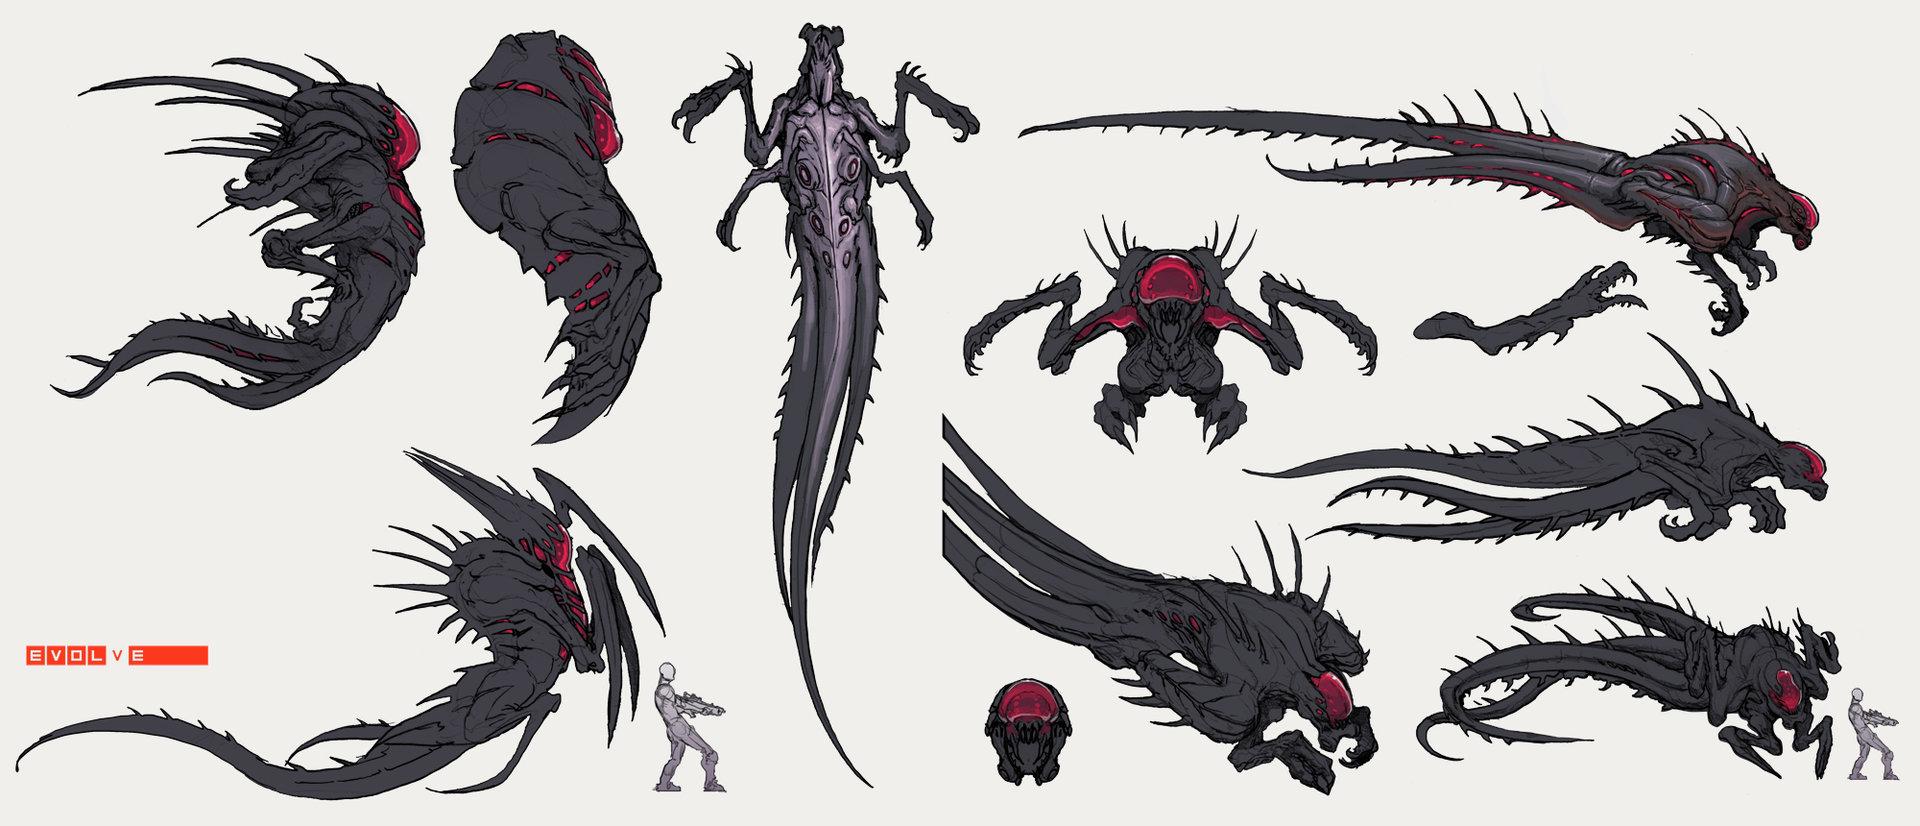 Evolve concept art wraith создание монстра